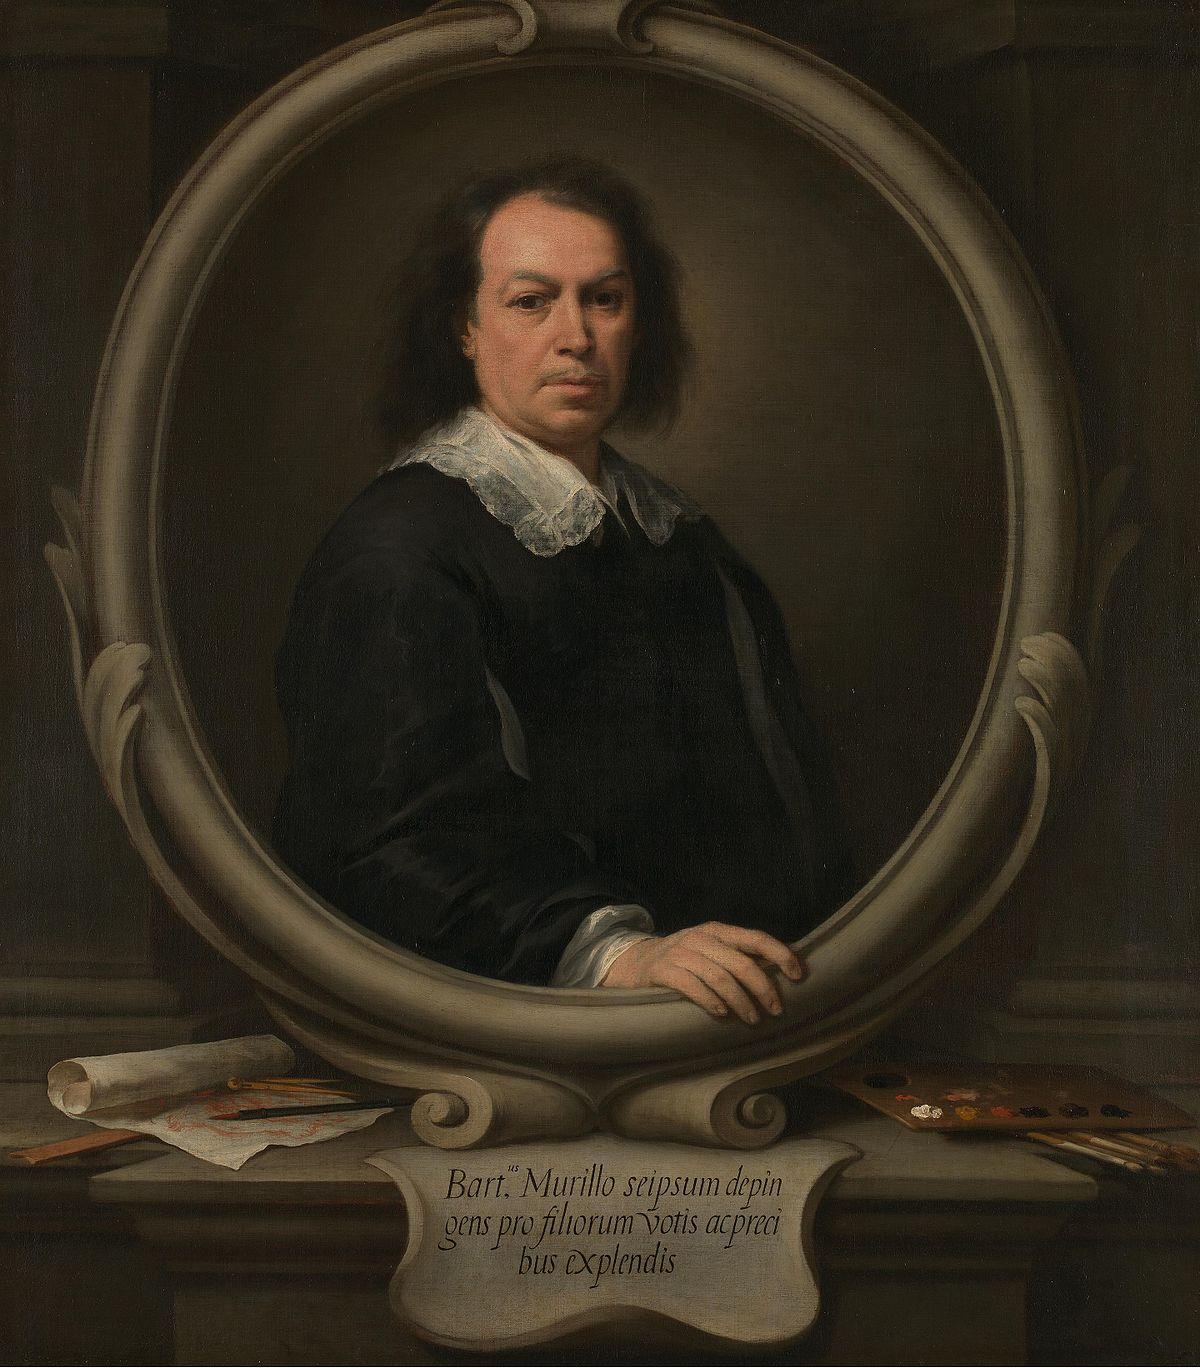 Bartolomé Esteban Murillo - Wikipedia, la enciclopedia libre